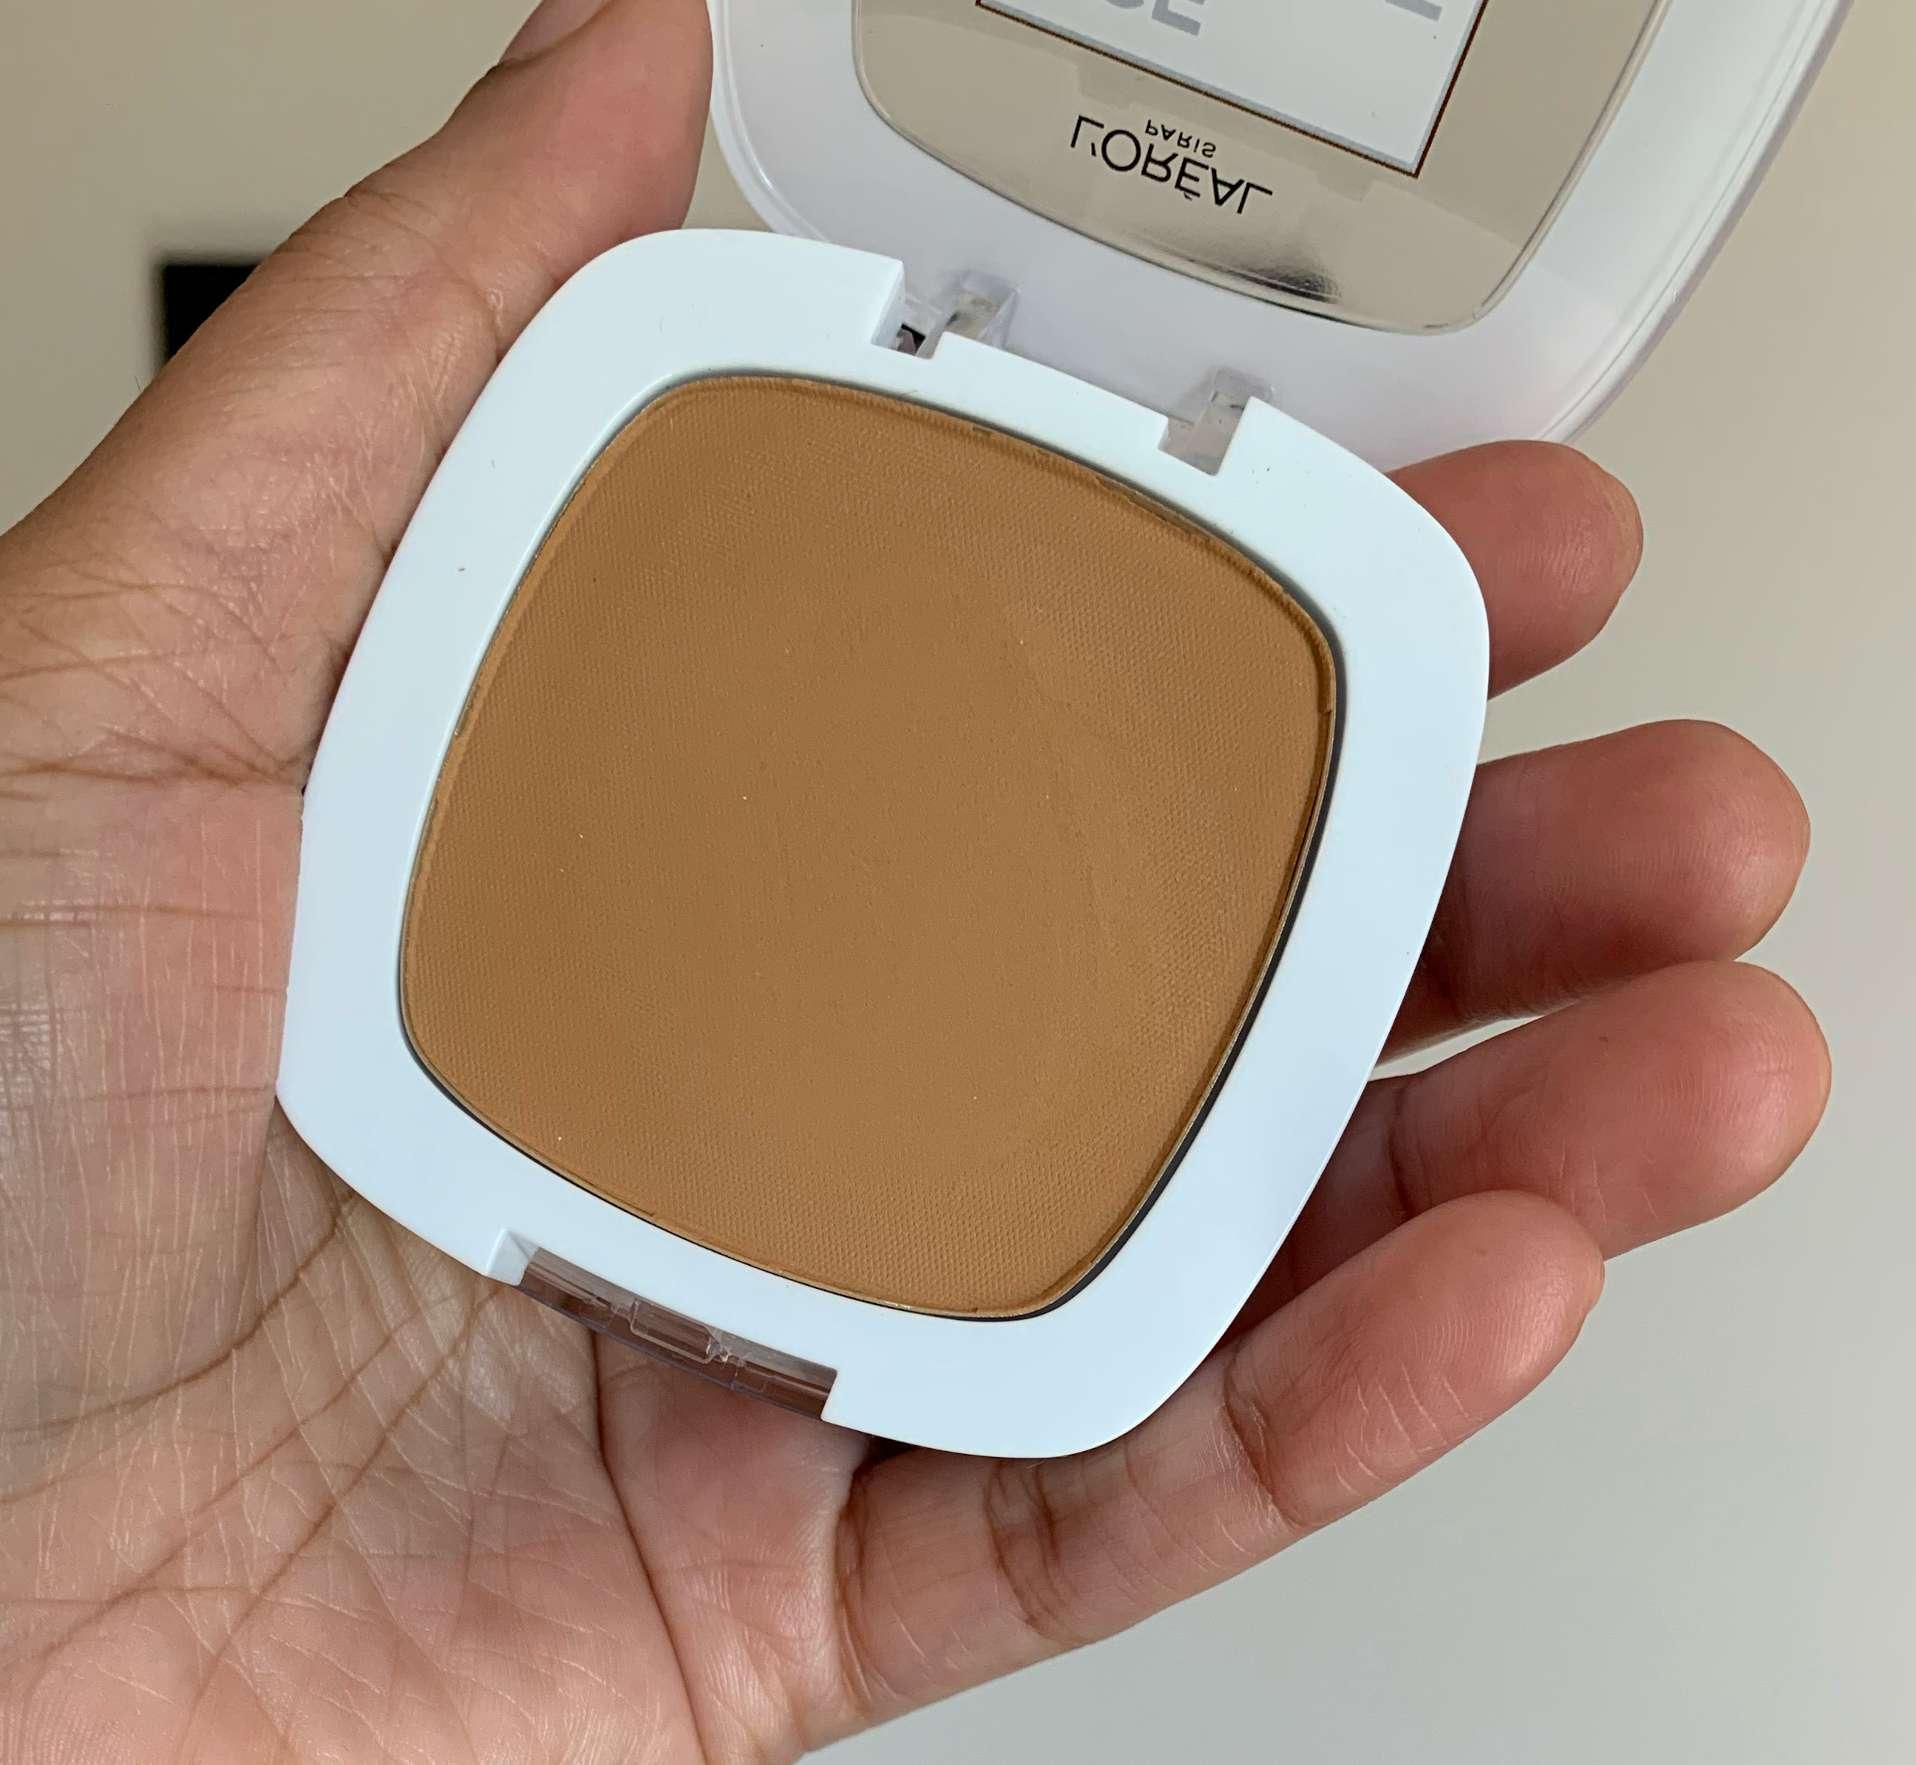 L'oreal Age Perfect Creamy Powder Foundation 340 Caramel Beige Swatch